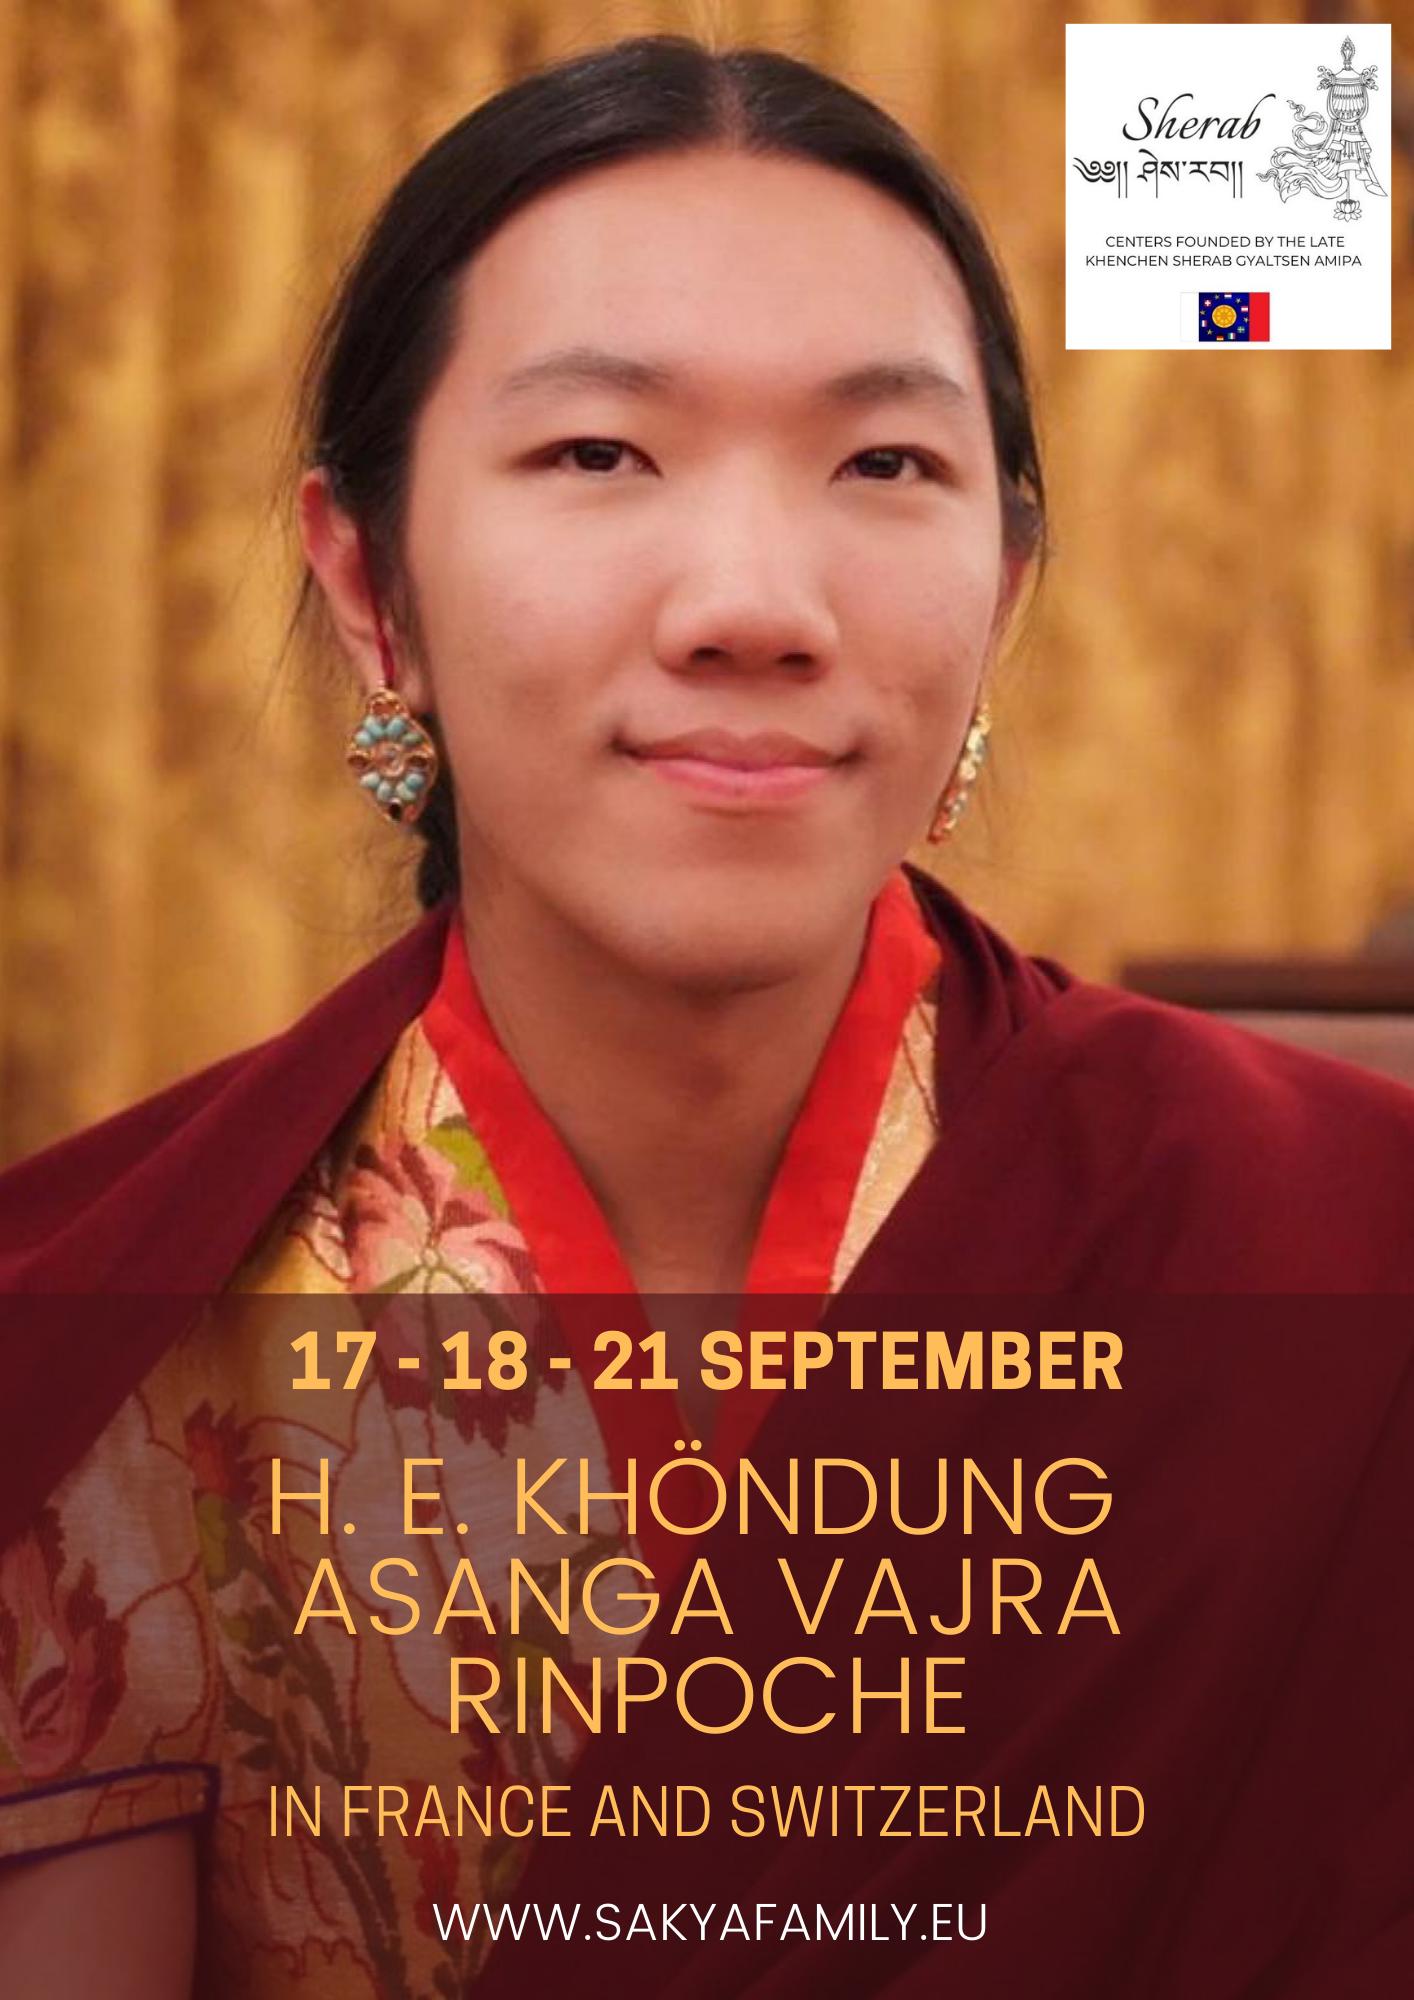 AROSIO EN (IT, ES, FR, DE, Catalan, NL) -S. E. Khöndung Asanga Vajra Rinpoche